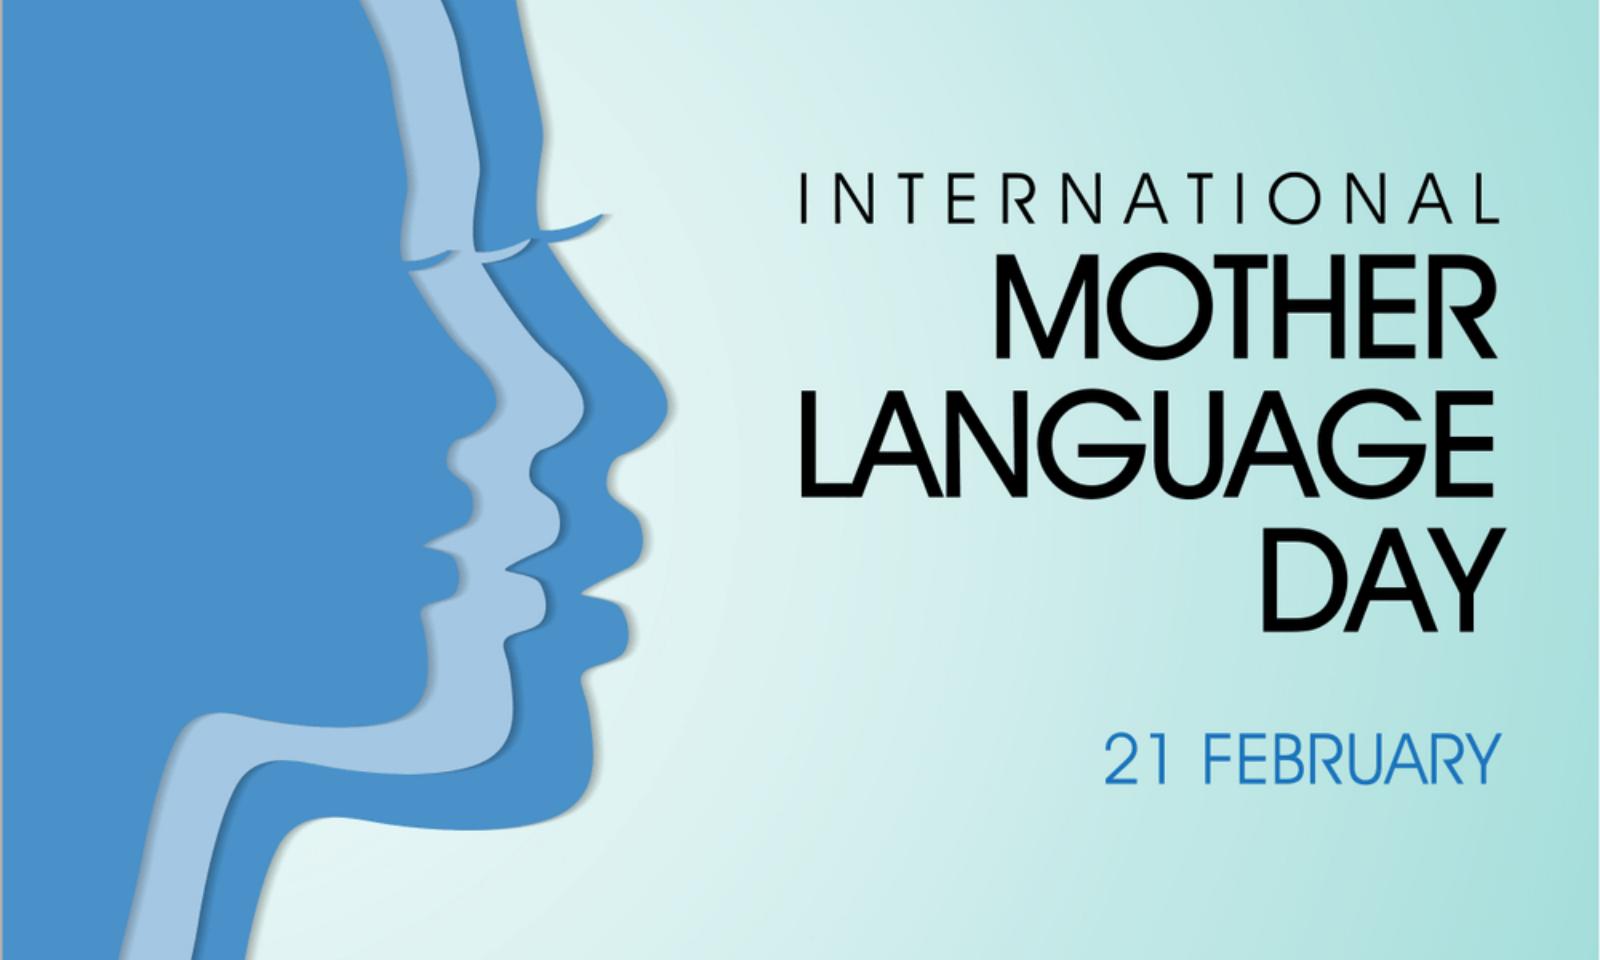 International Mother Language Day 2020.